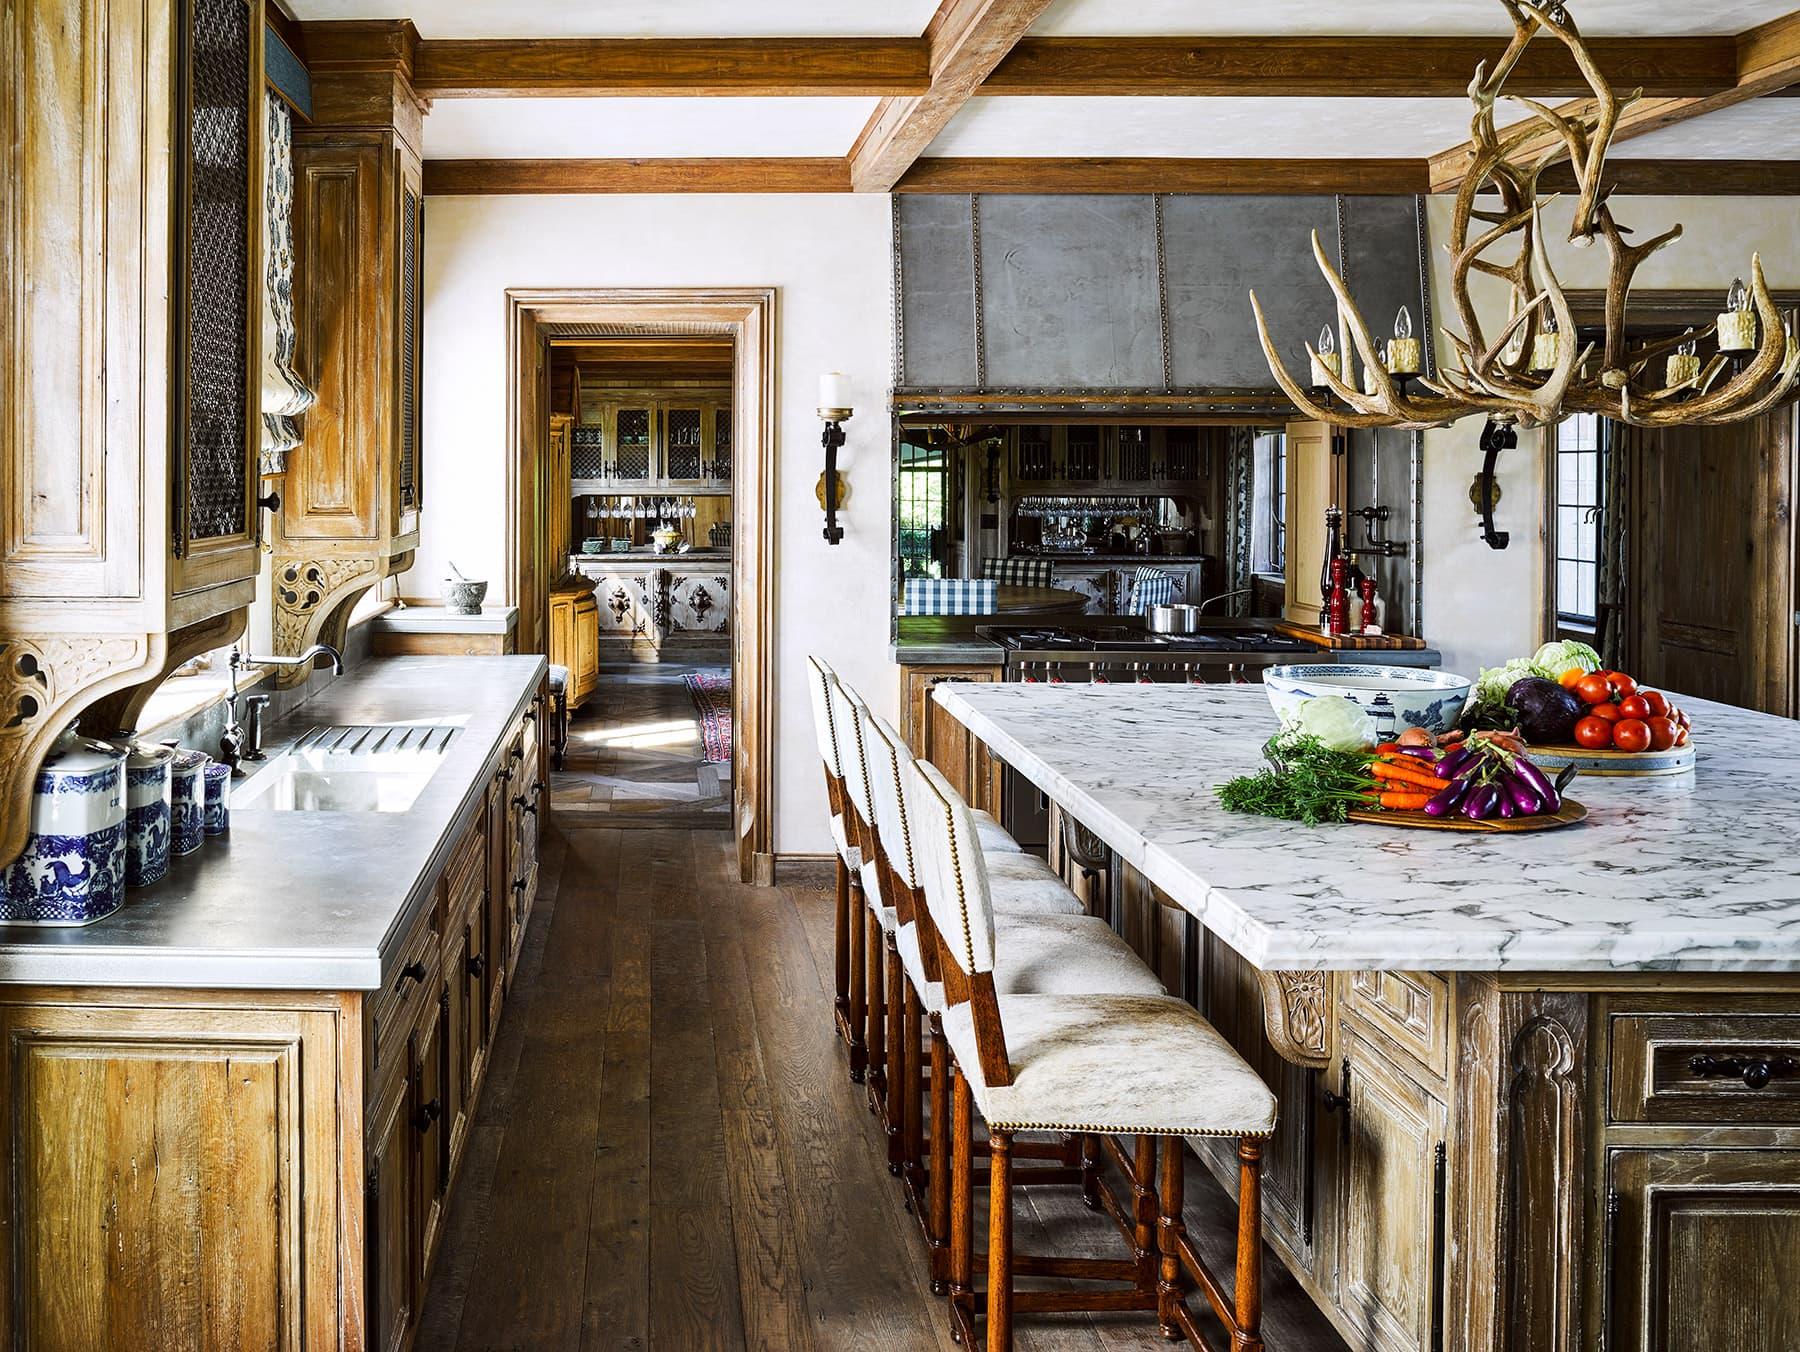 ralph lauren furniture, michael kors furniture, pierre cardin furniture, dior furniture, on tommy hilfiger home furniture dining room